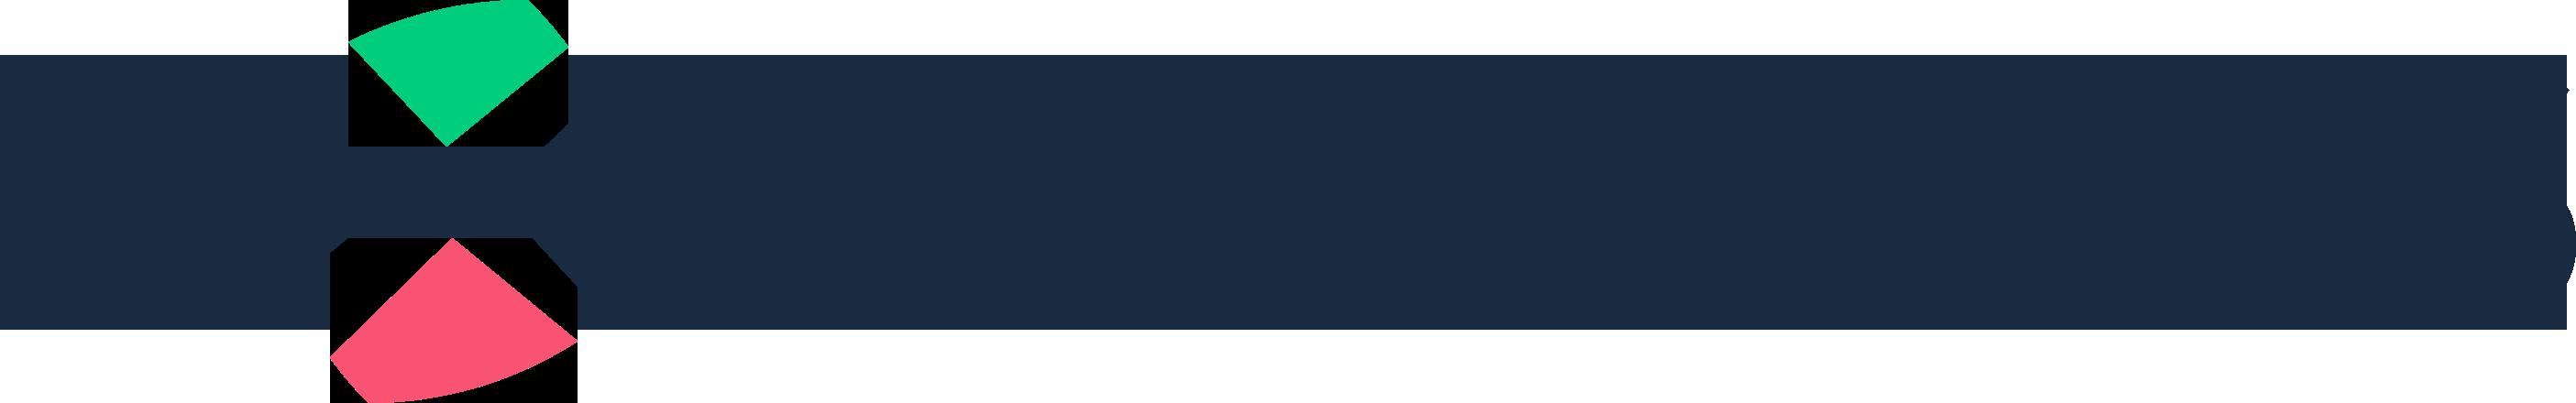 ExMarkets logo